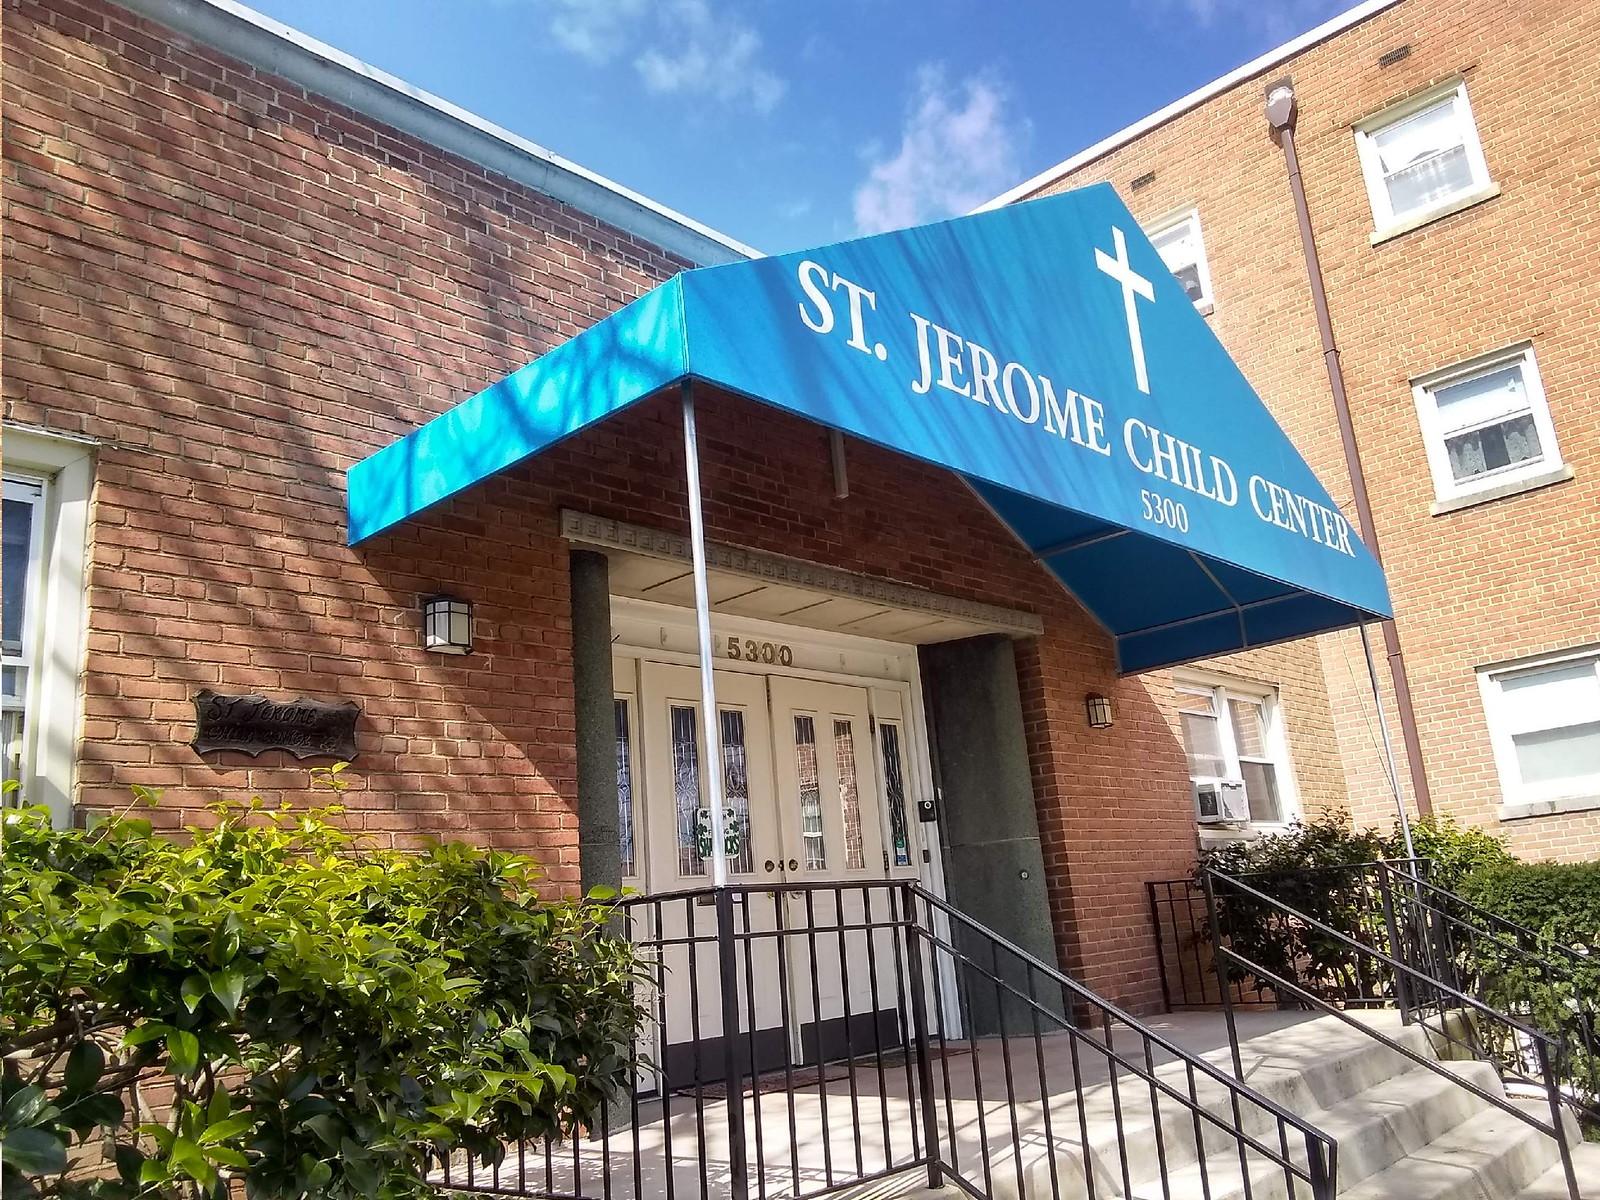 Church Entrance Awning